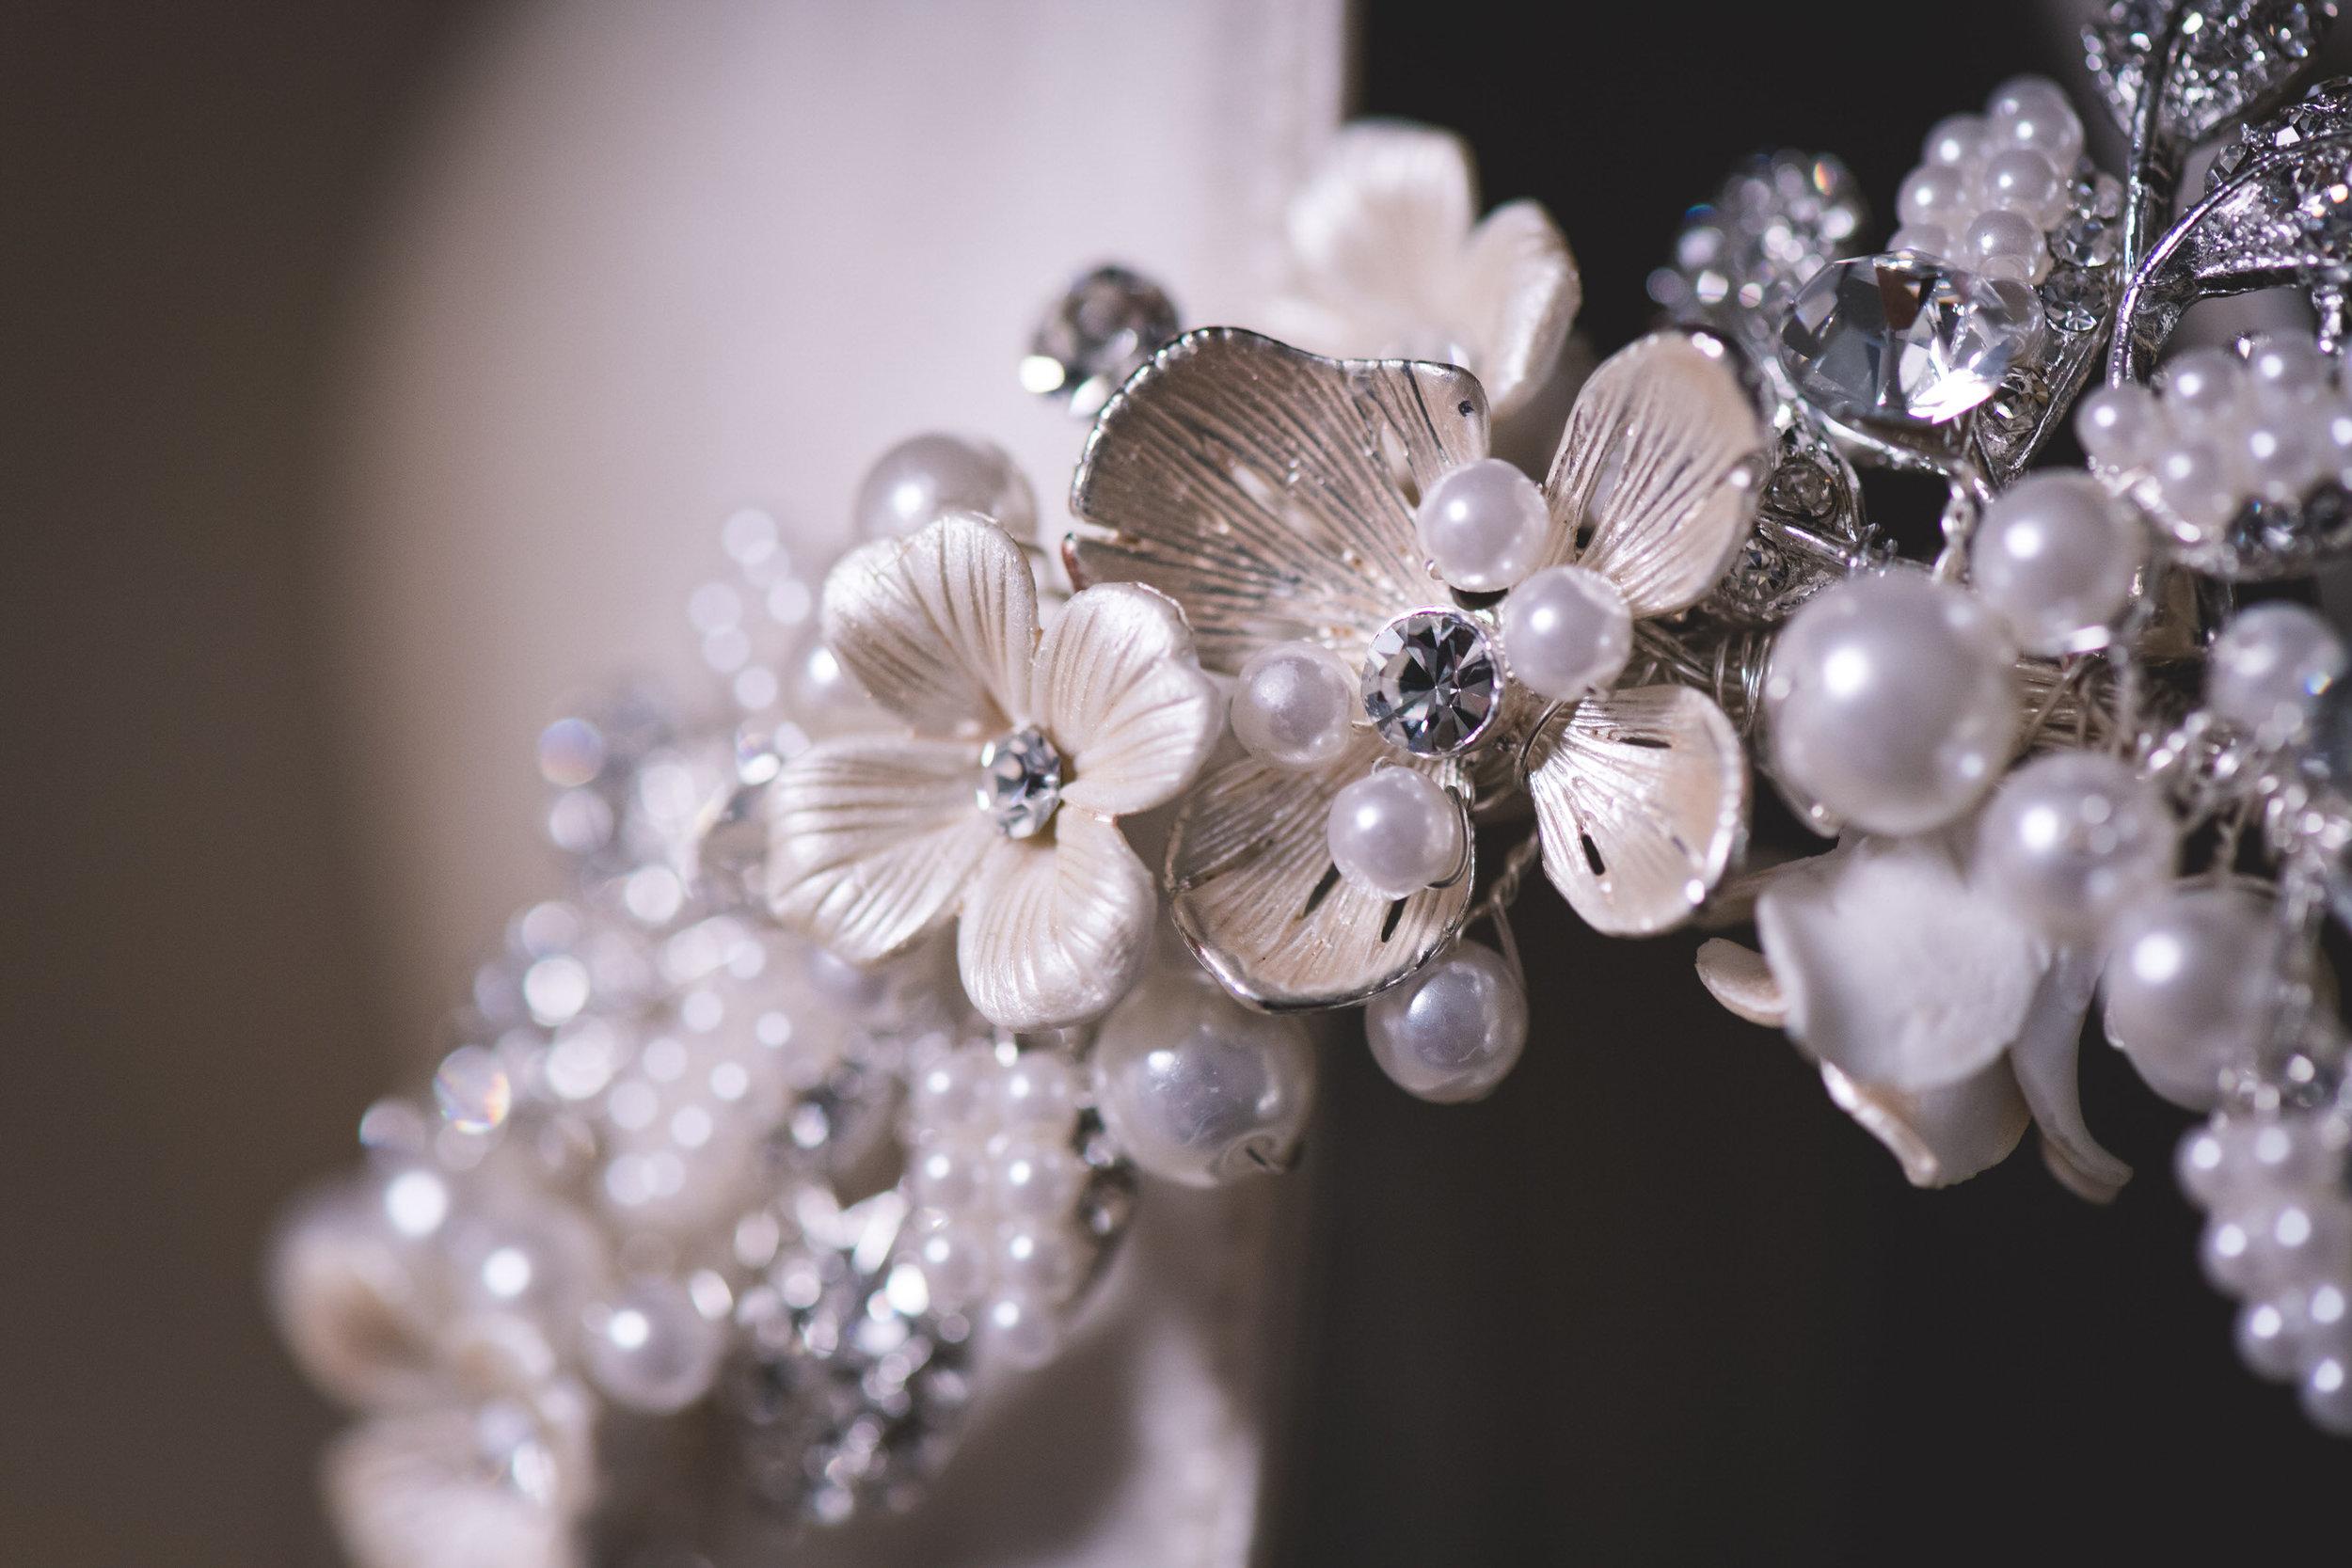 wentworth-woodhous-yorkshire-wedding-photographer-4.jpg